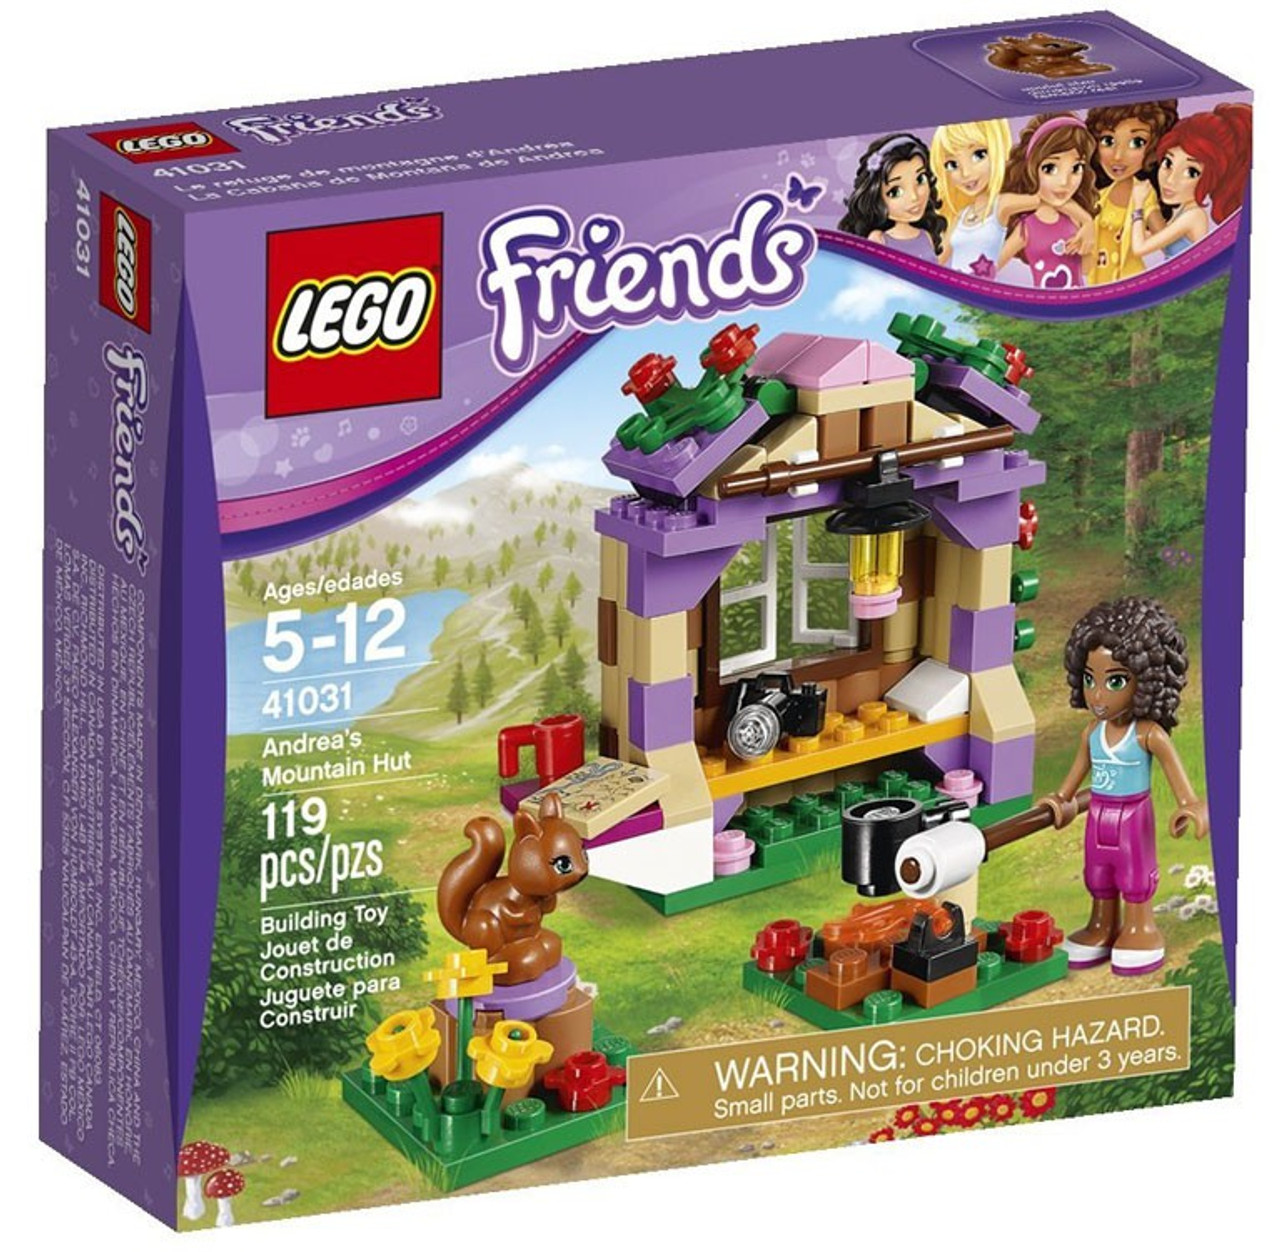 LEGO Friends Andrea's Mountain Hut Set #41031